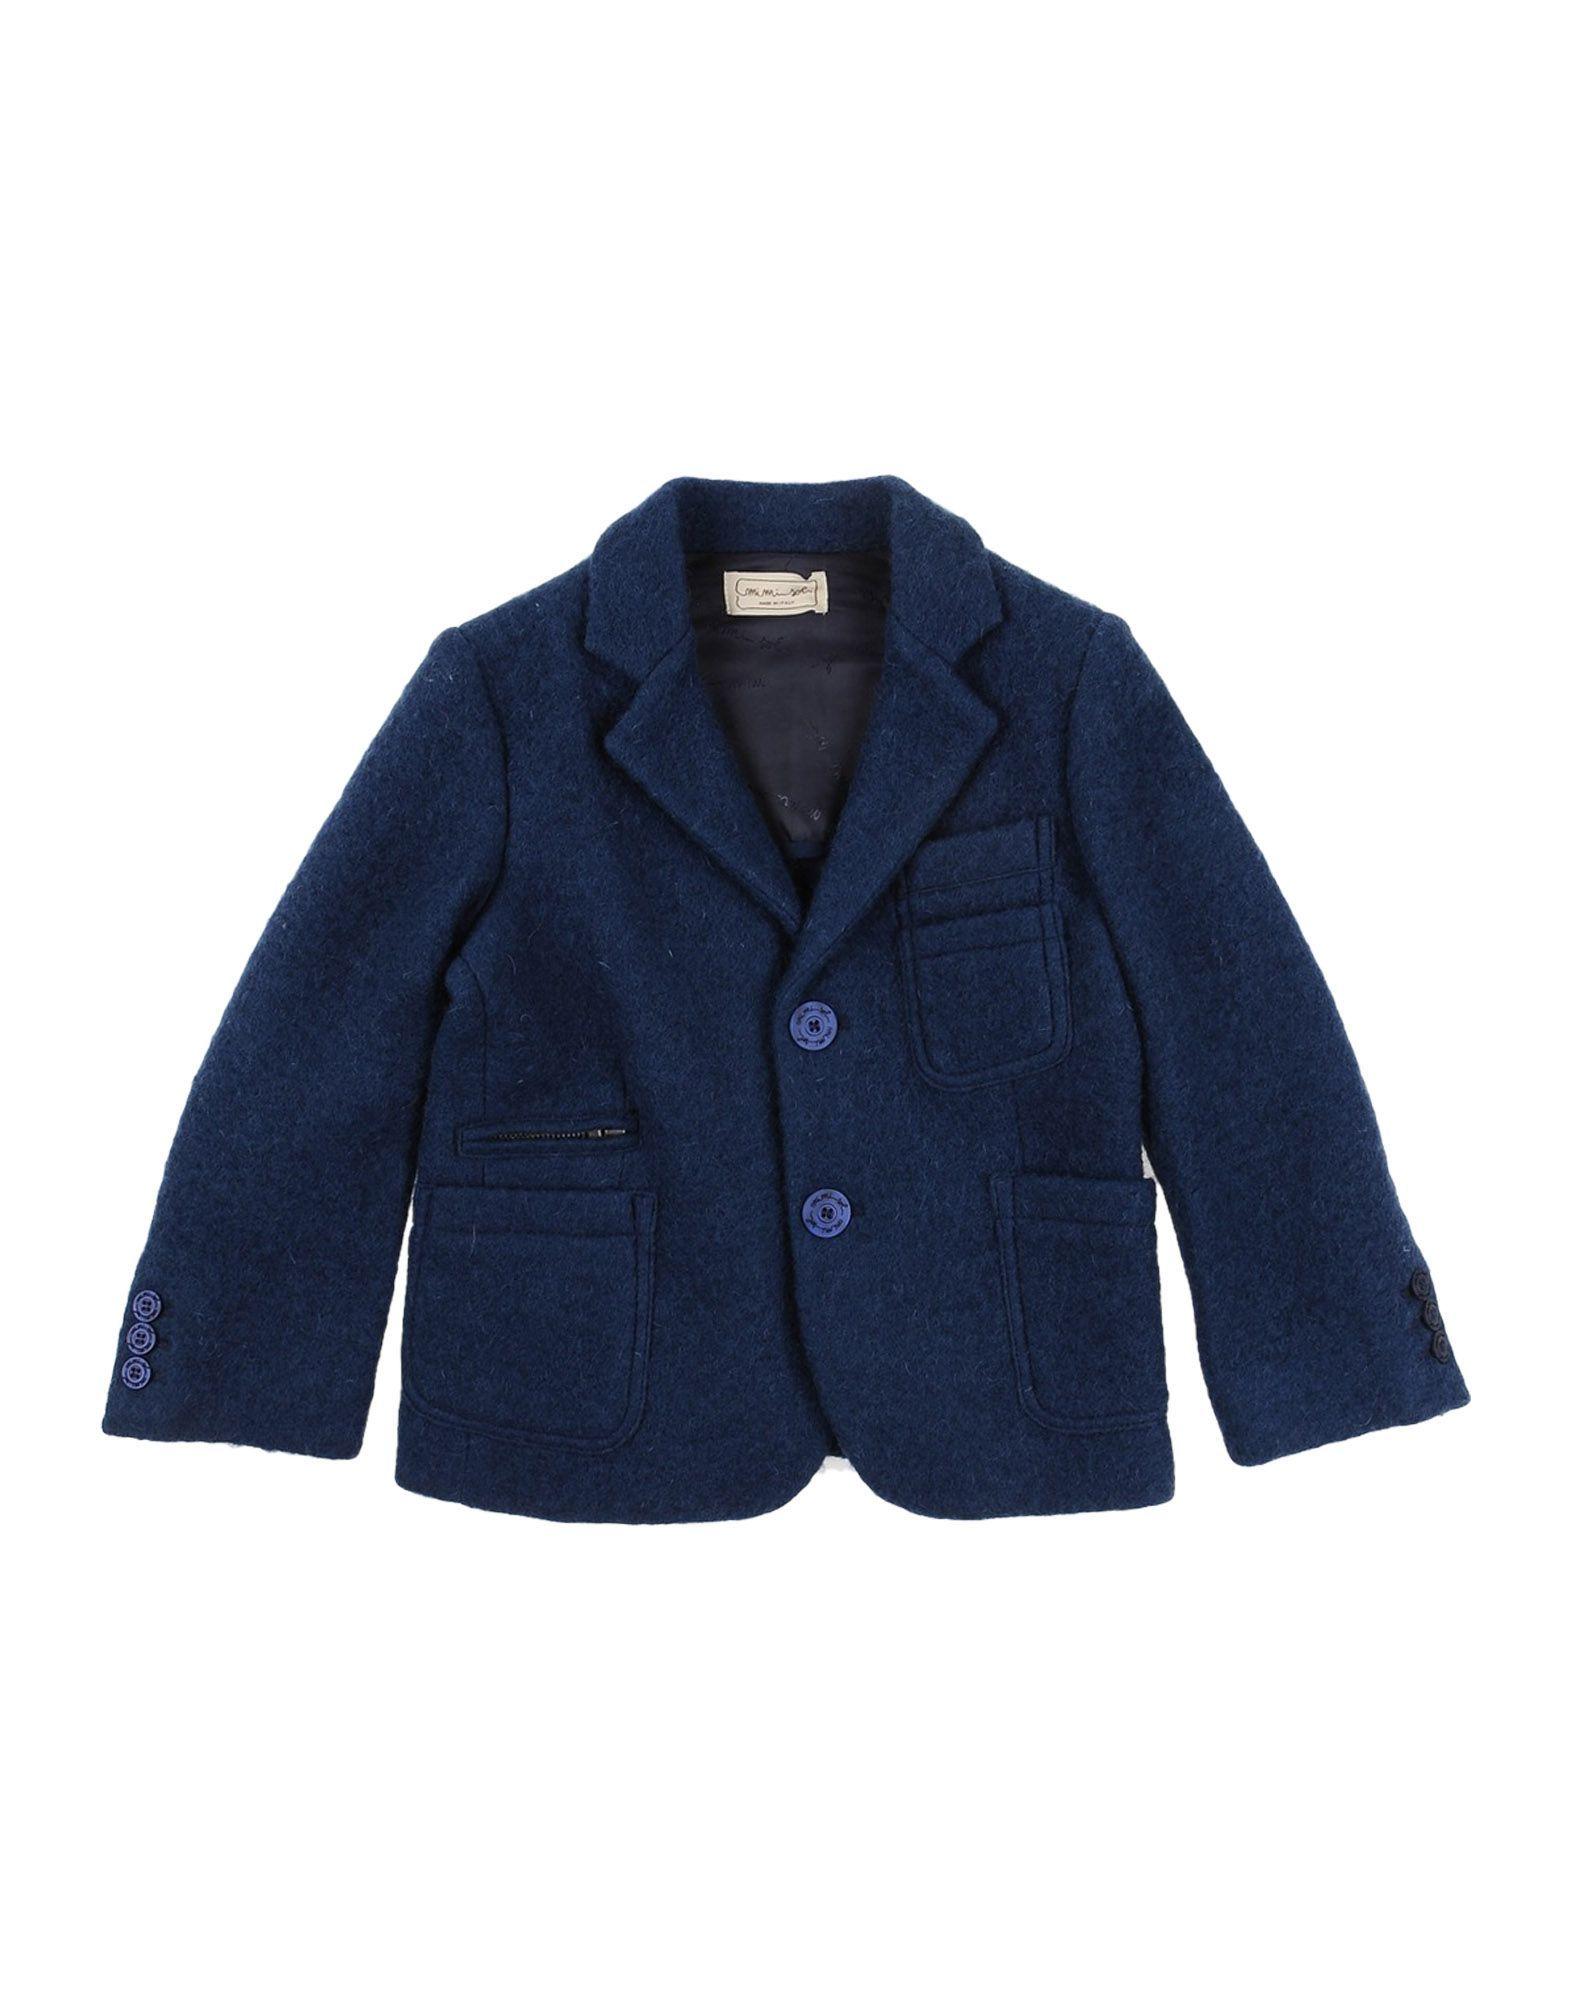 SUITS AND JACKETS Mimisol Dark blue Boy Wool